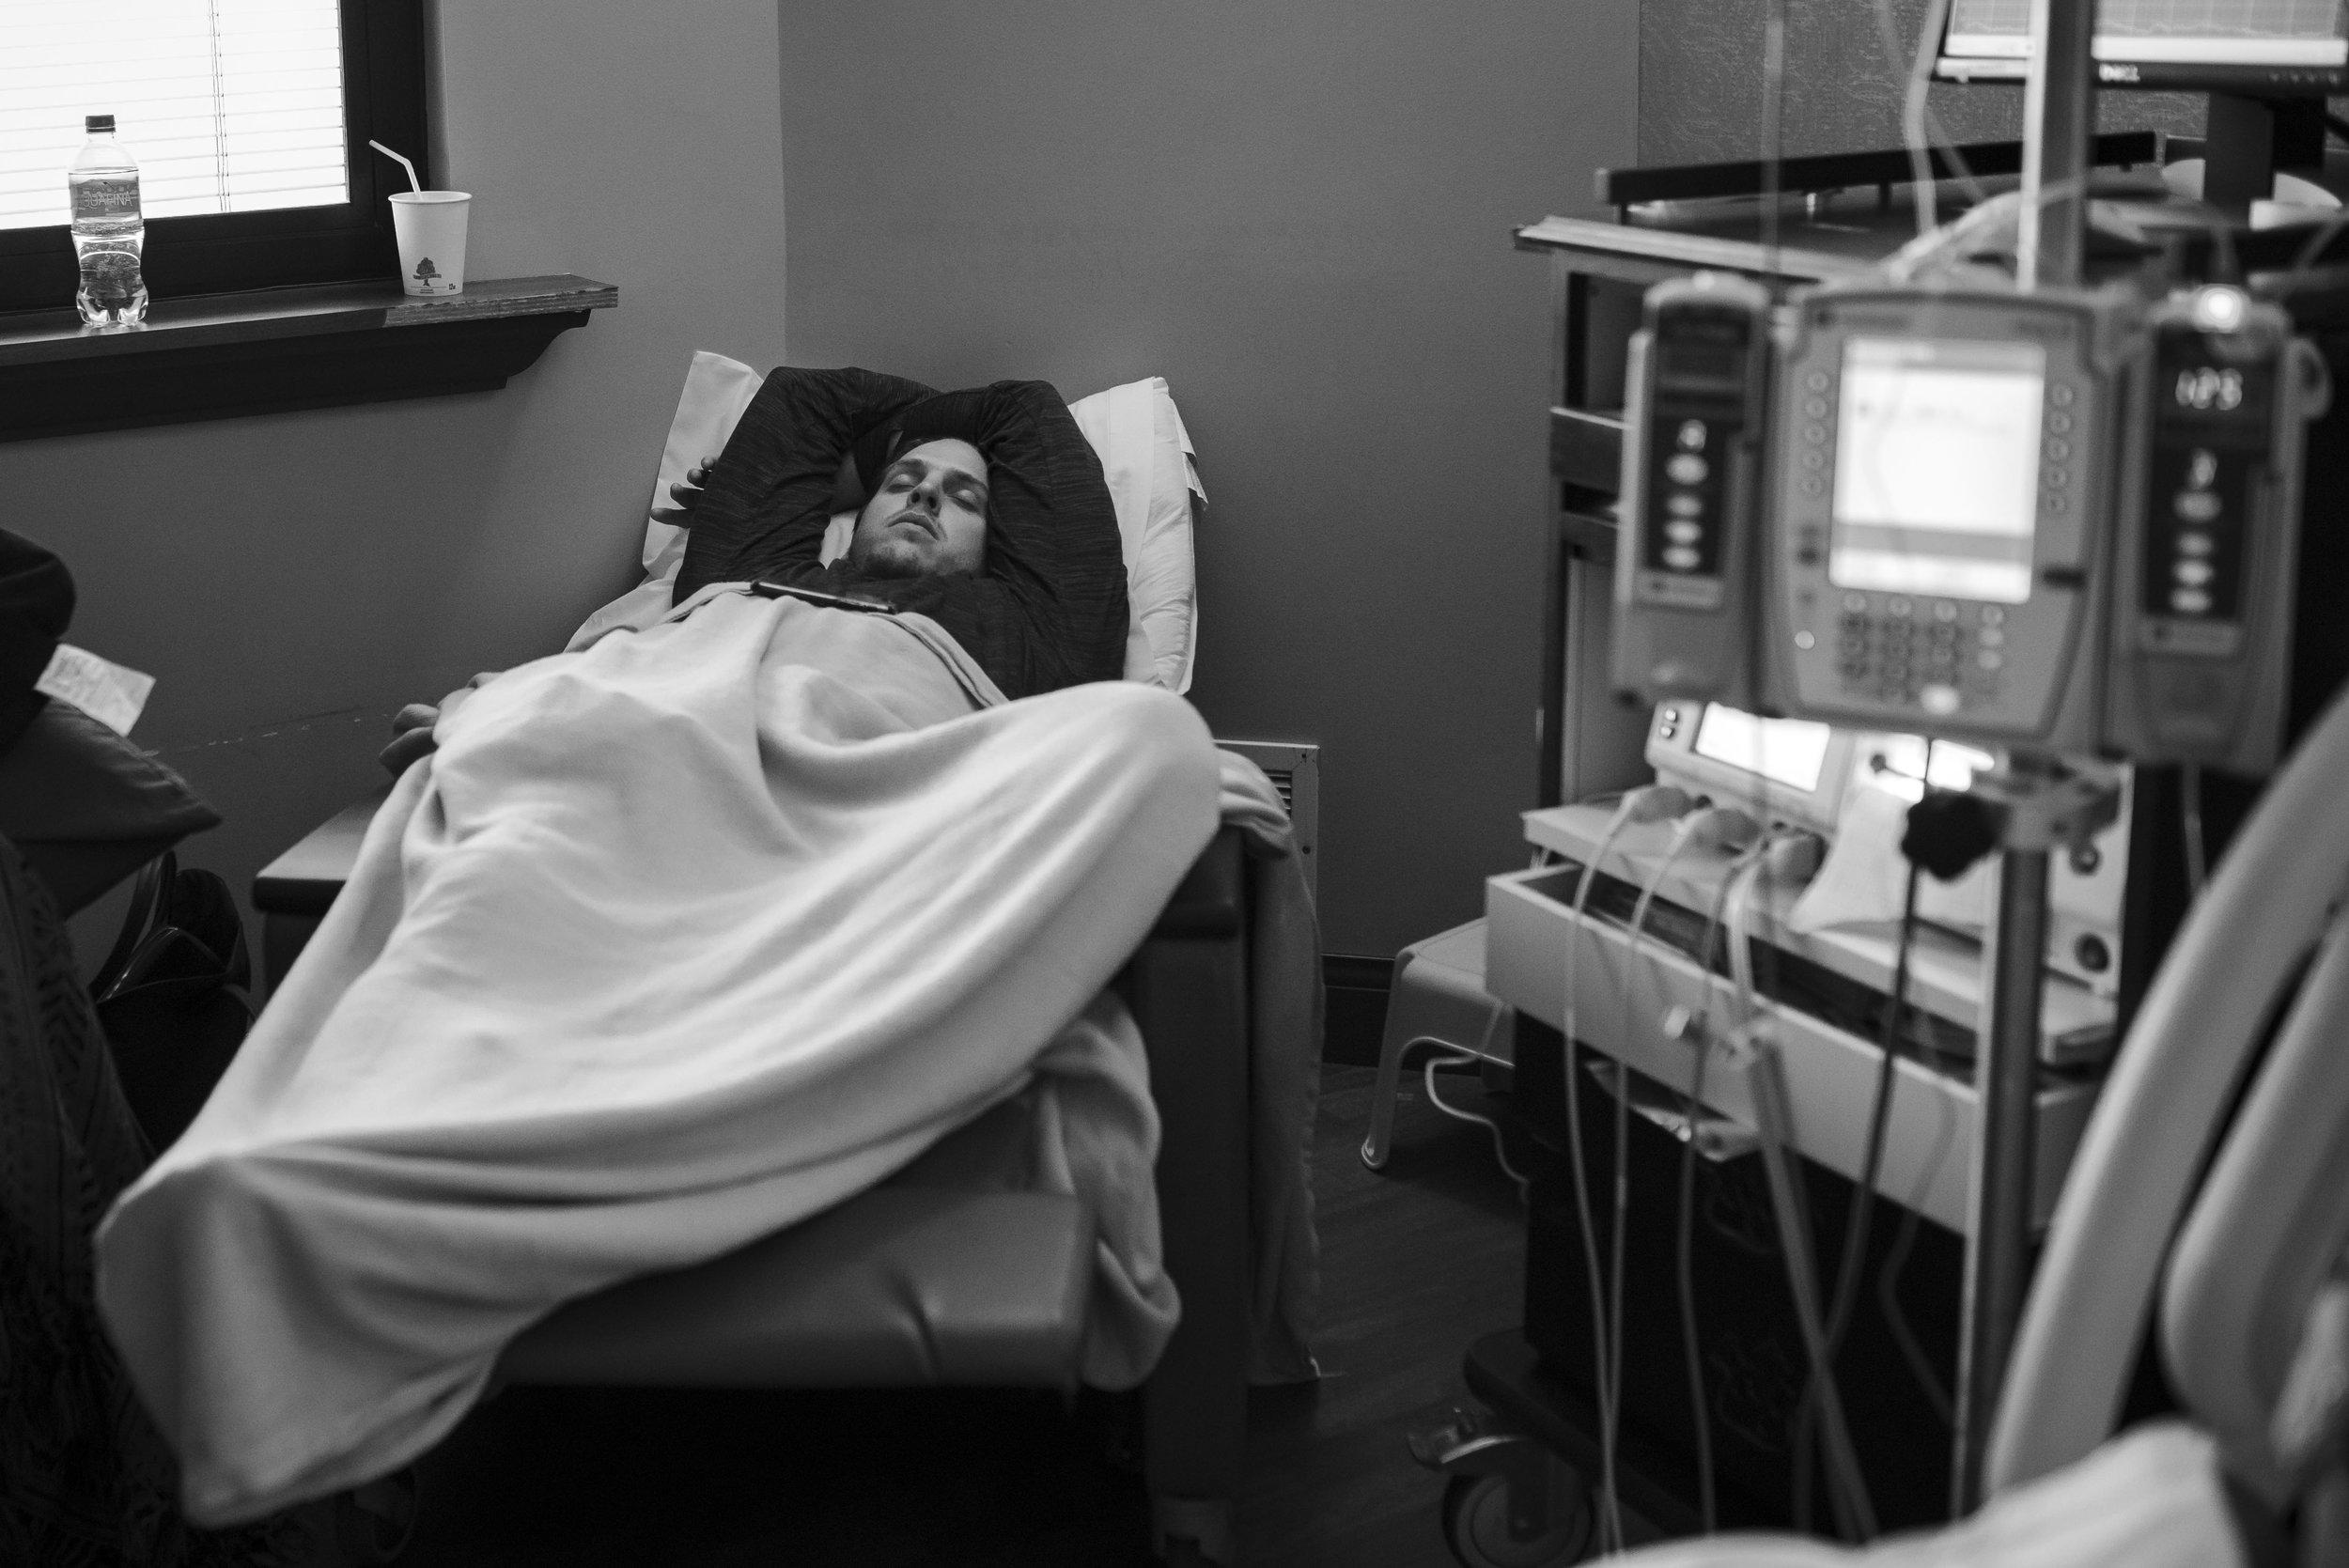 057-Full-Circle-st-vincents-southside-hospital-birth-jacksonville.JPG